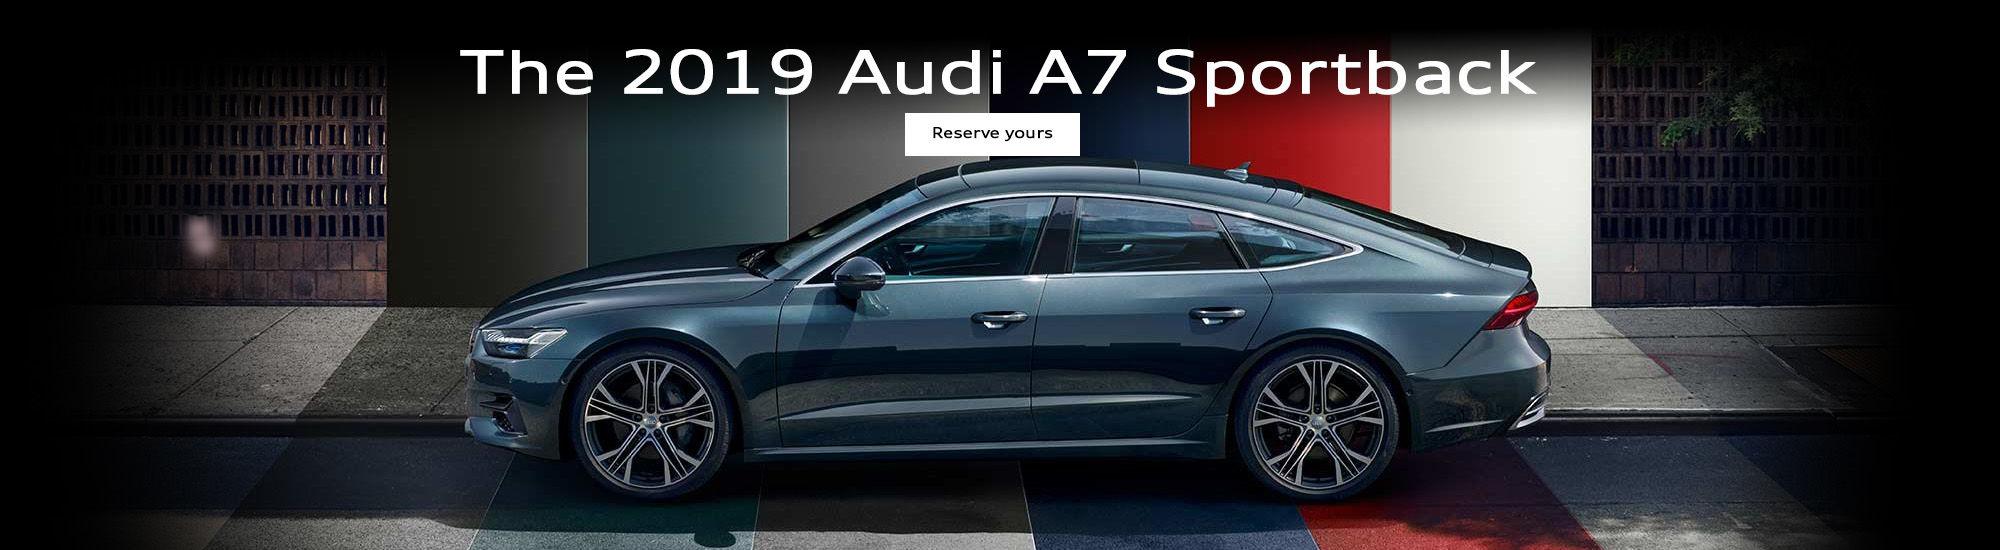 The 2019 Audi A7 Sportback